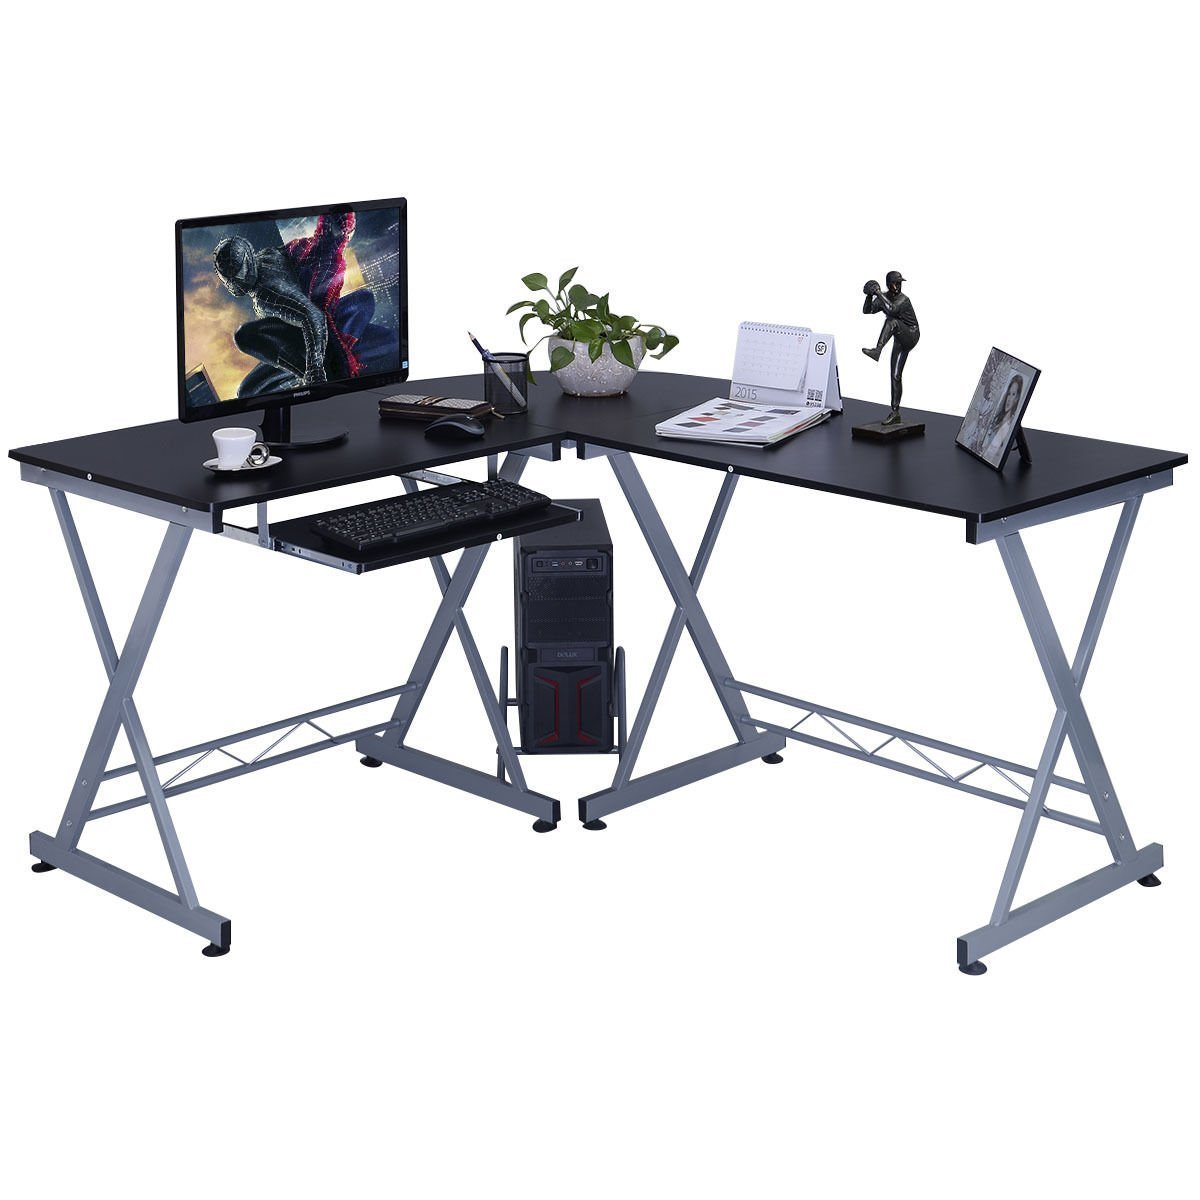 buy shape home office. Amazon.com: L-Shape Computer Desk Wood Table Laptop Corner Workstation Home Office Black: Kitchen \u0026 Dining Buy Shape